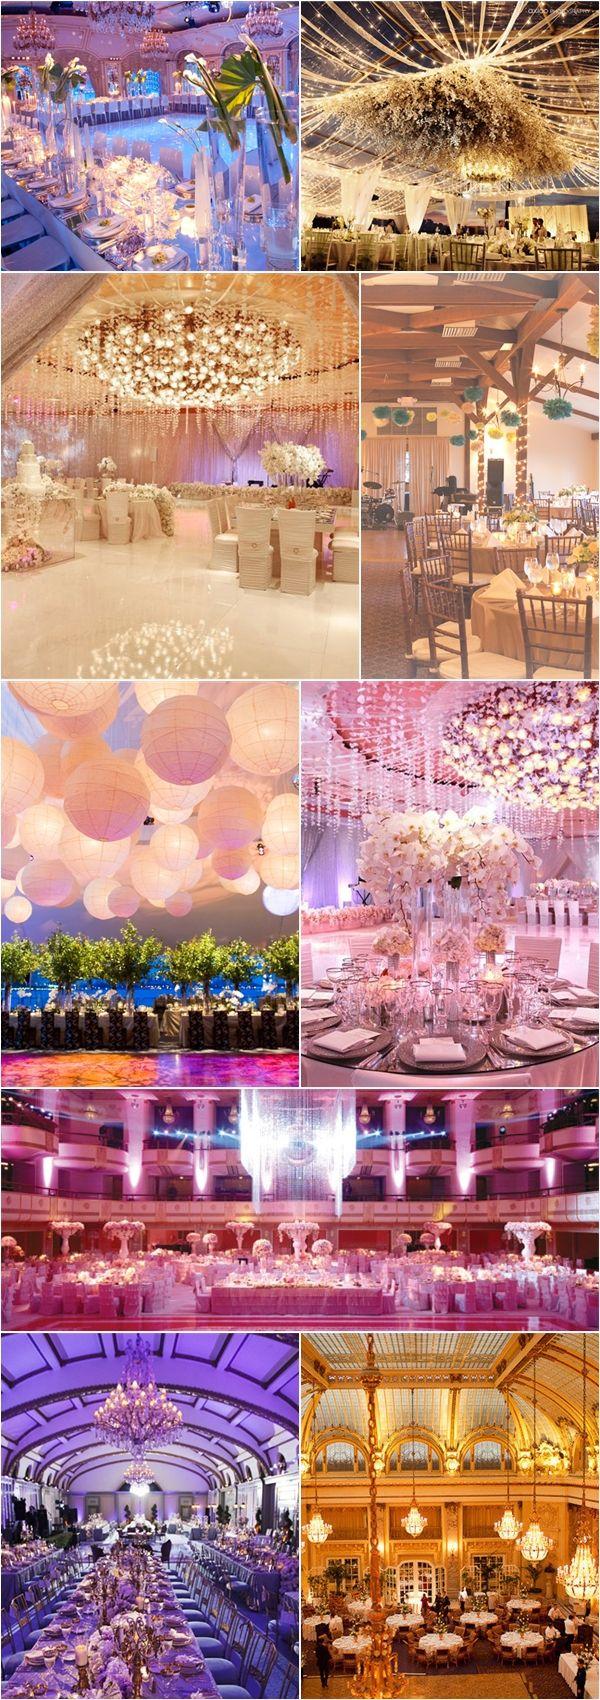 Praise Wedding » Wedding Inspiration and Planning » 34 Wedding Reception Themes